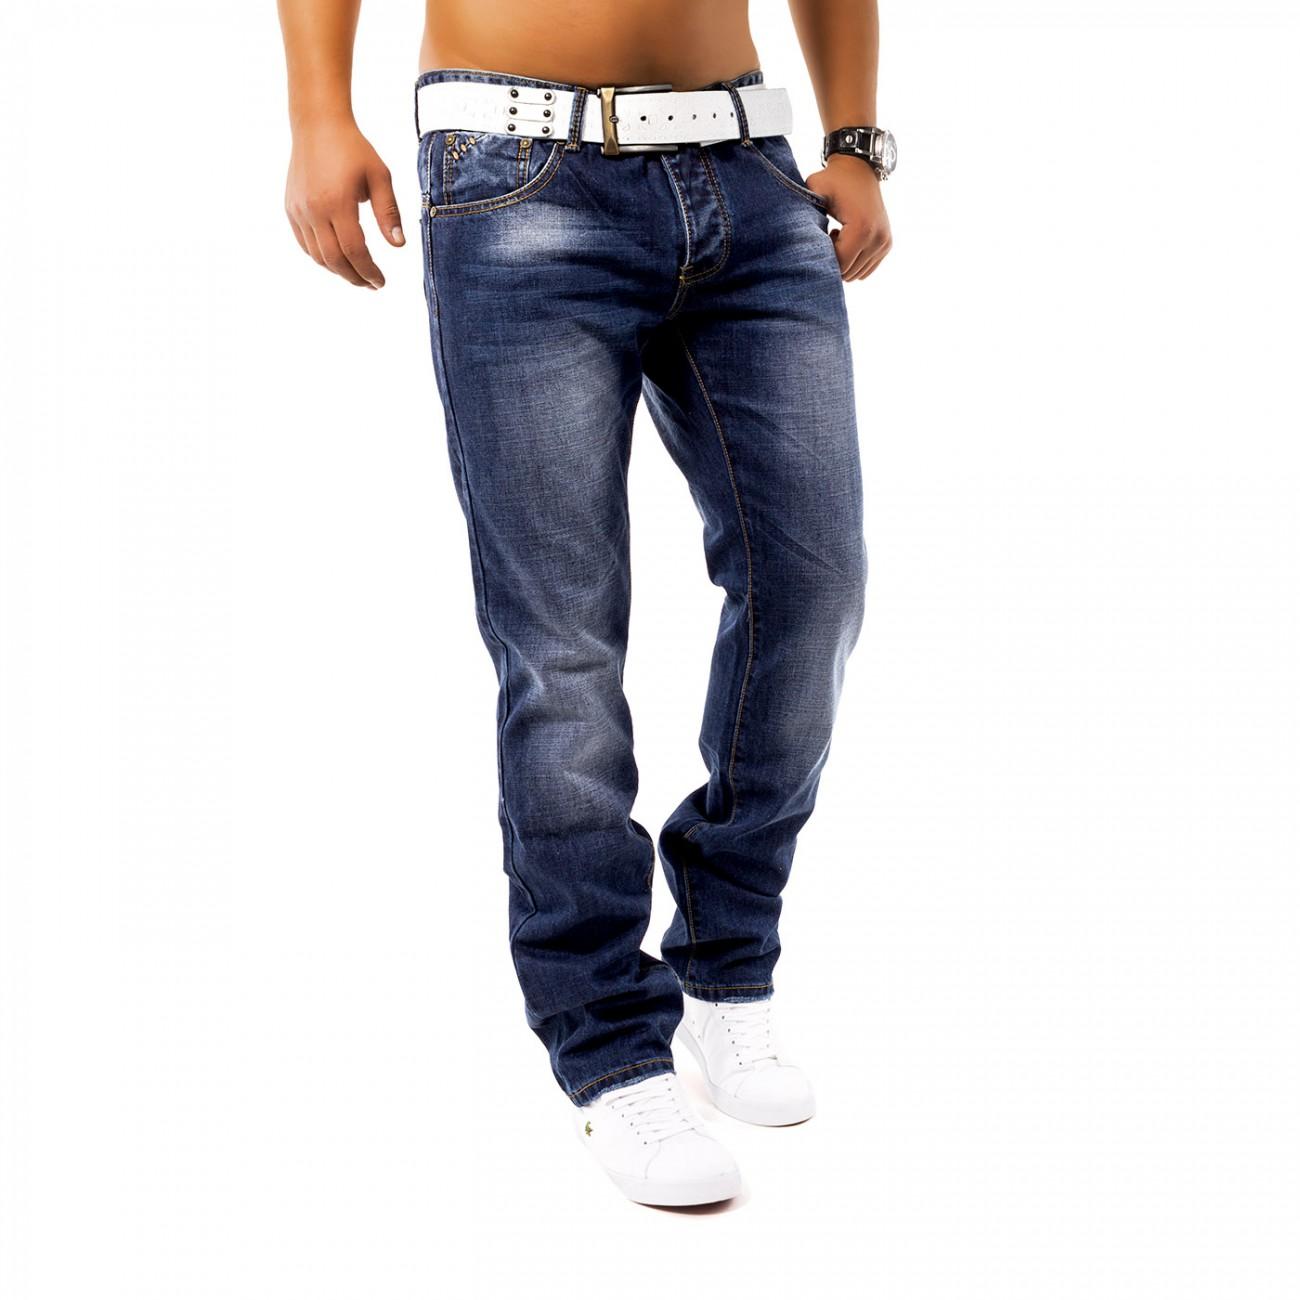 herren marken jeans career hose denim vintage clubwear destroid kaufen bei. Black Bedroom Furniture Sets. Home Design Ideas